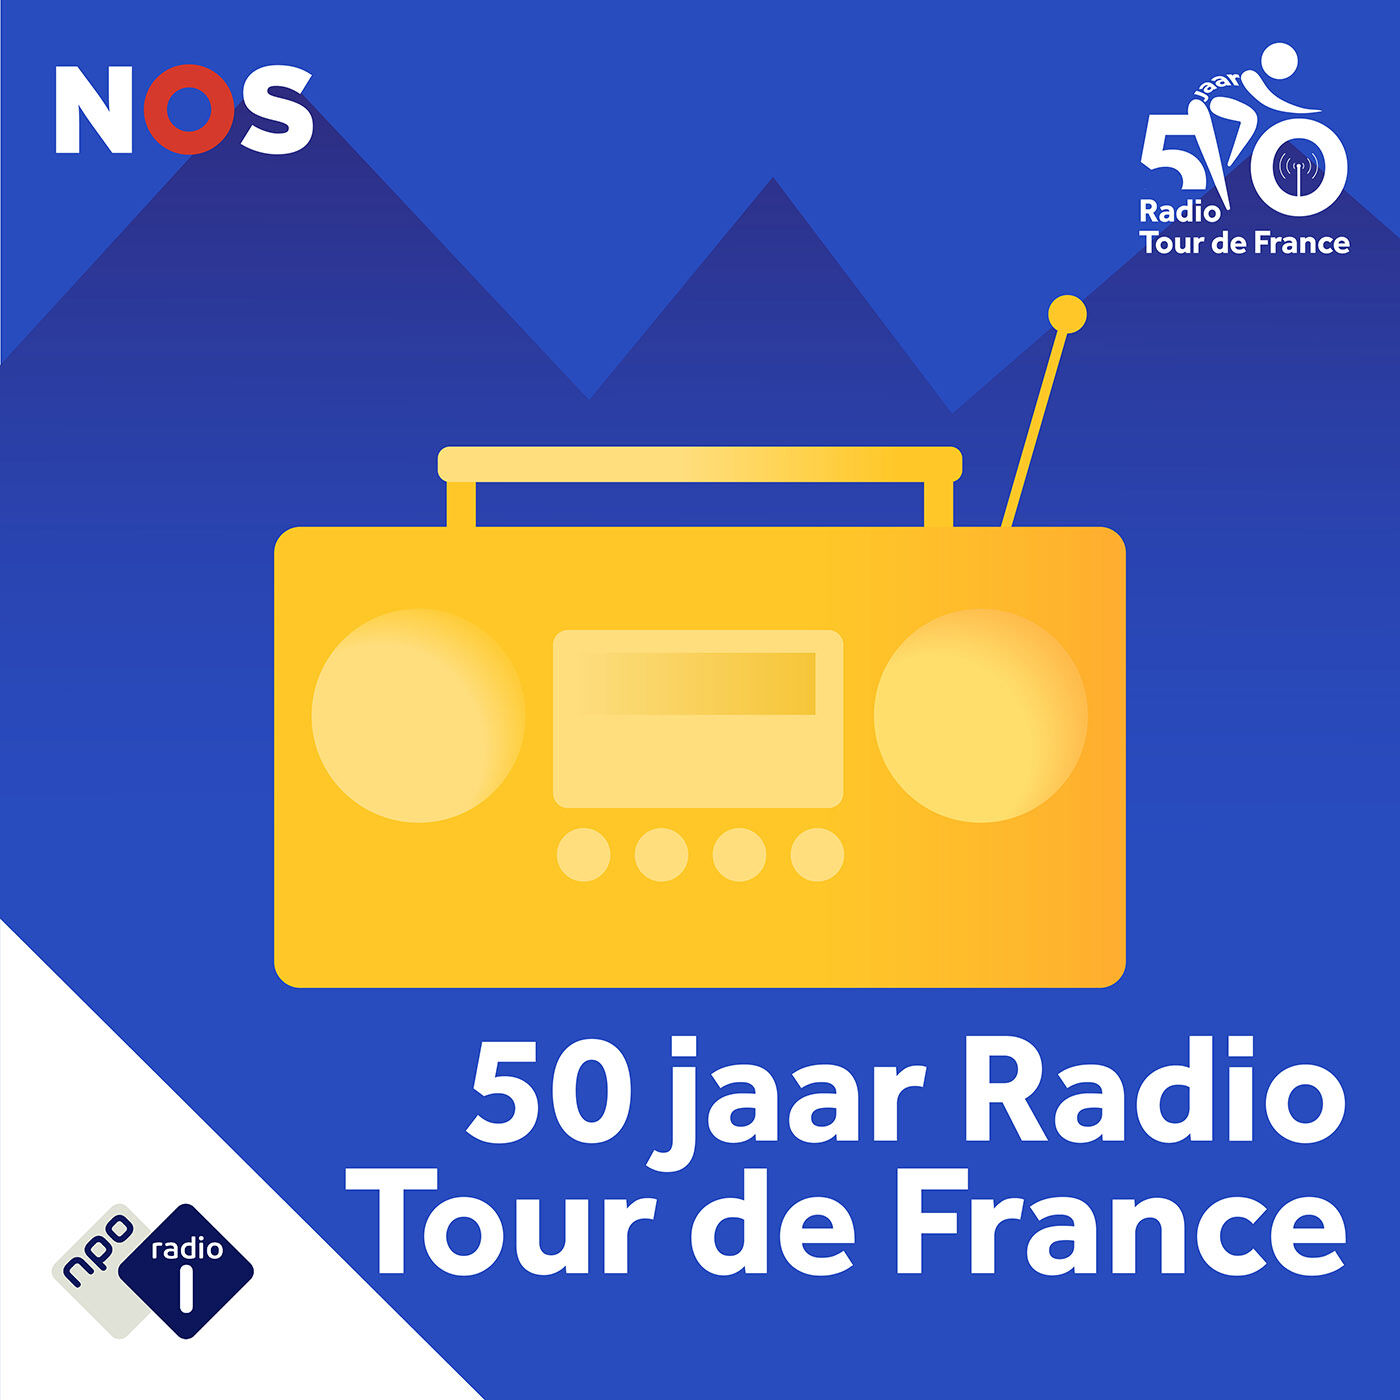 50 jaar Radio Tour de France logo